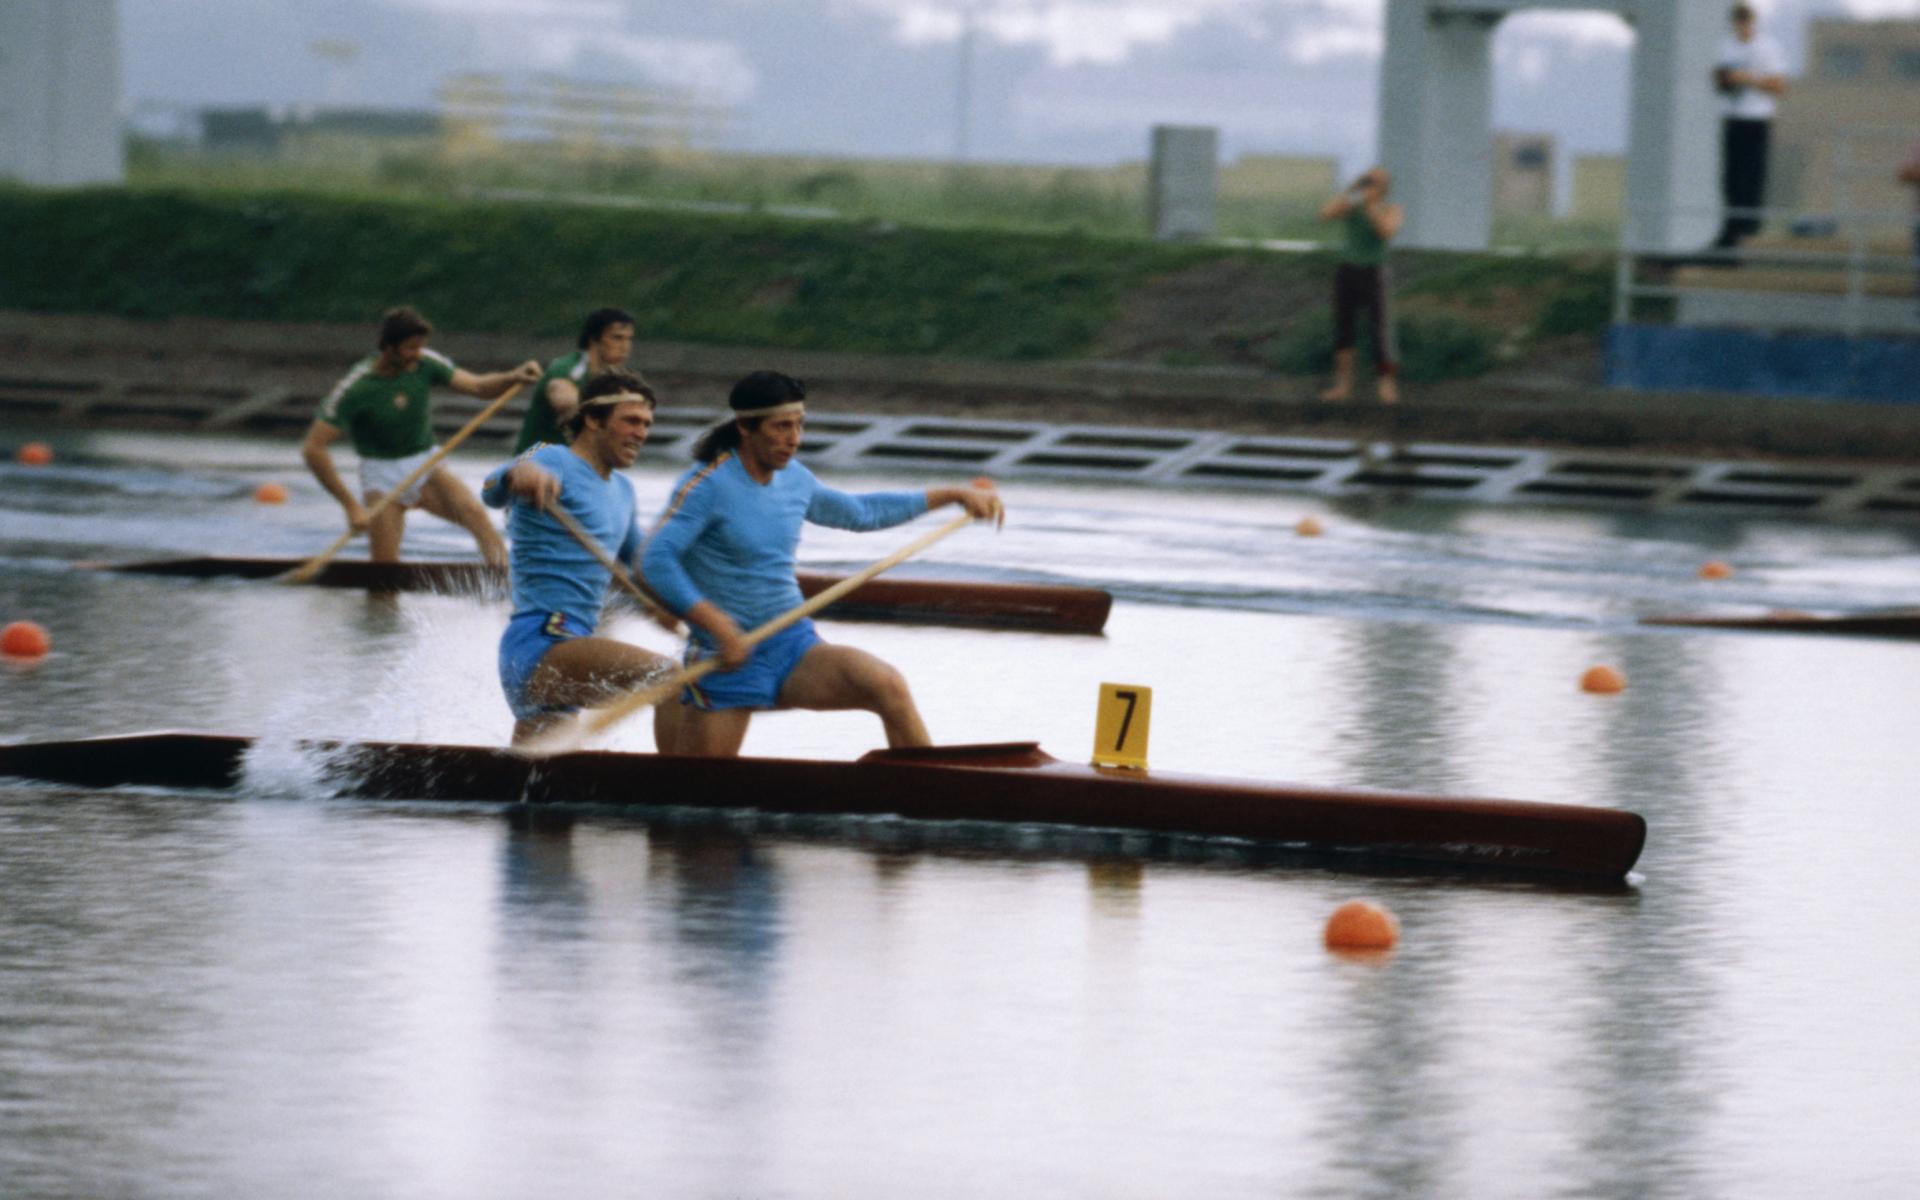 Иван Пацайкин и Тома Симеонов на Олимпиаде 1980 в Москве